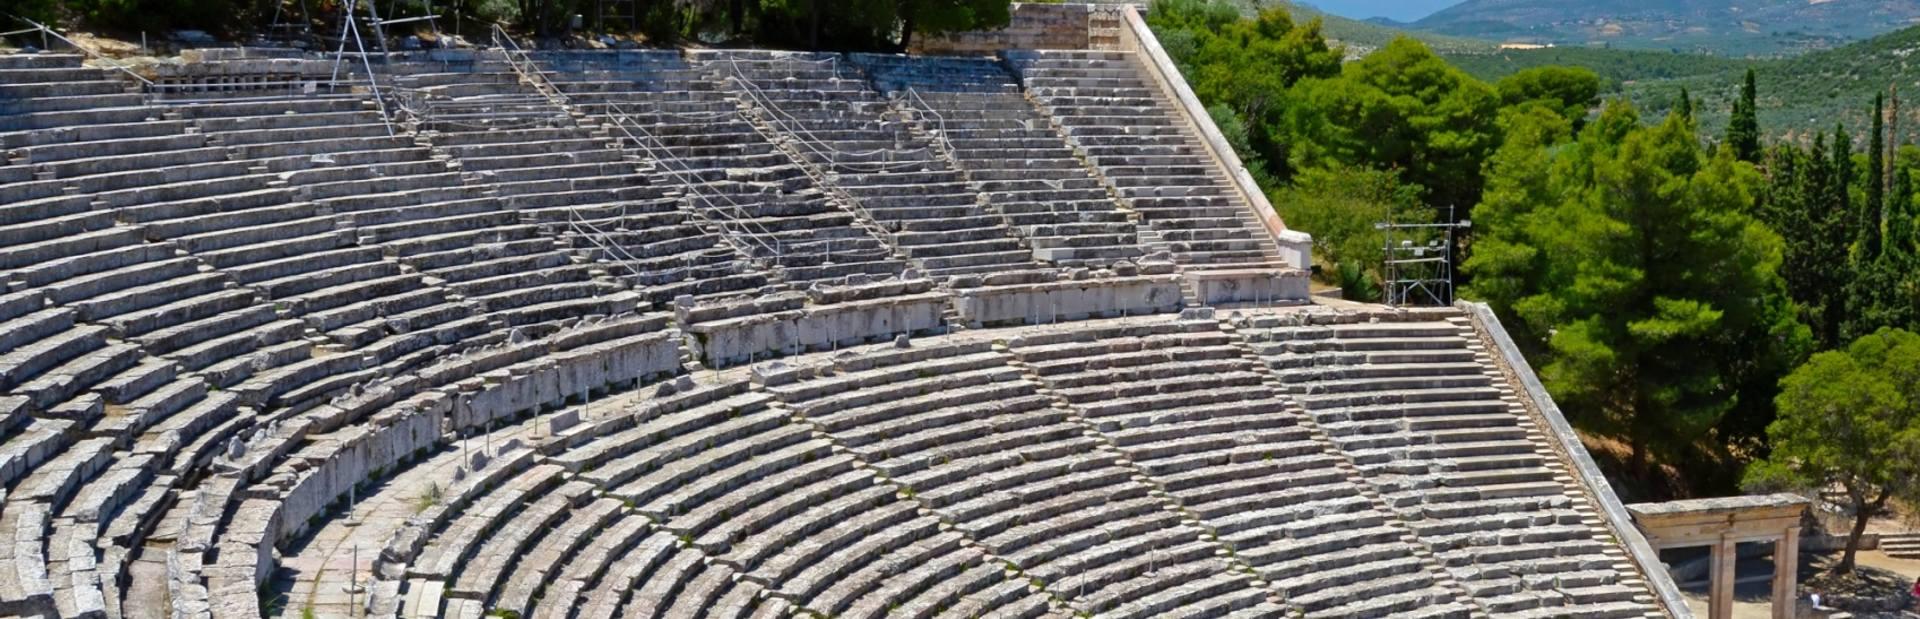 Epidavros charter itineraries